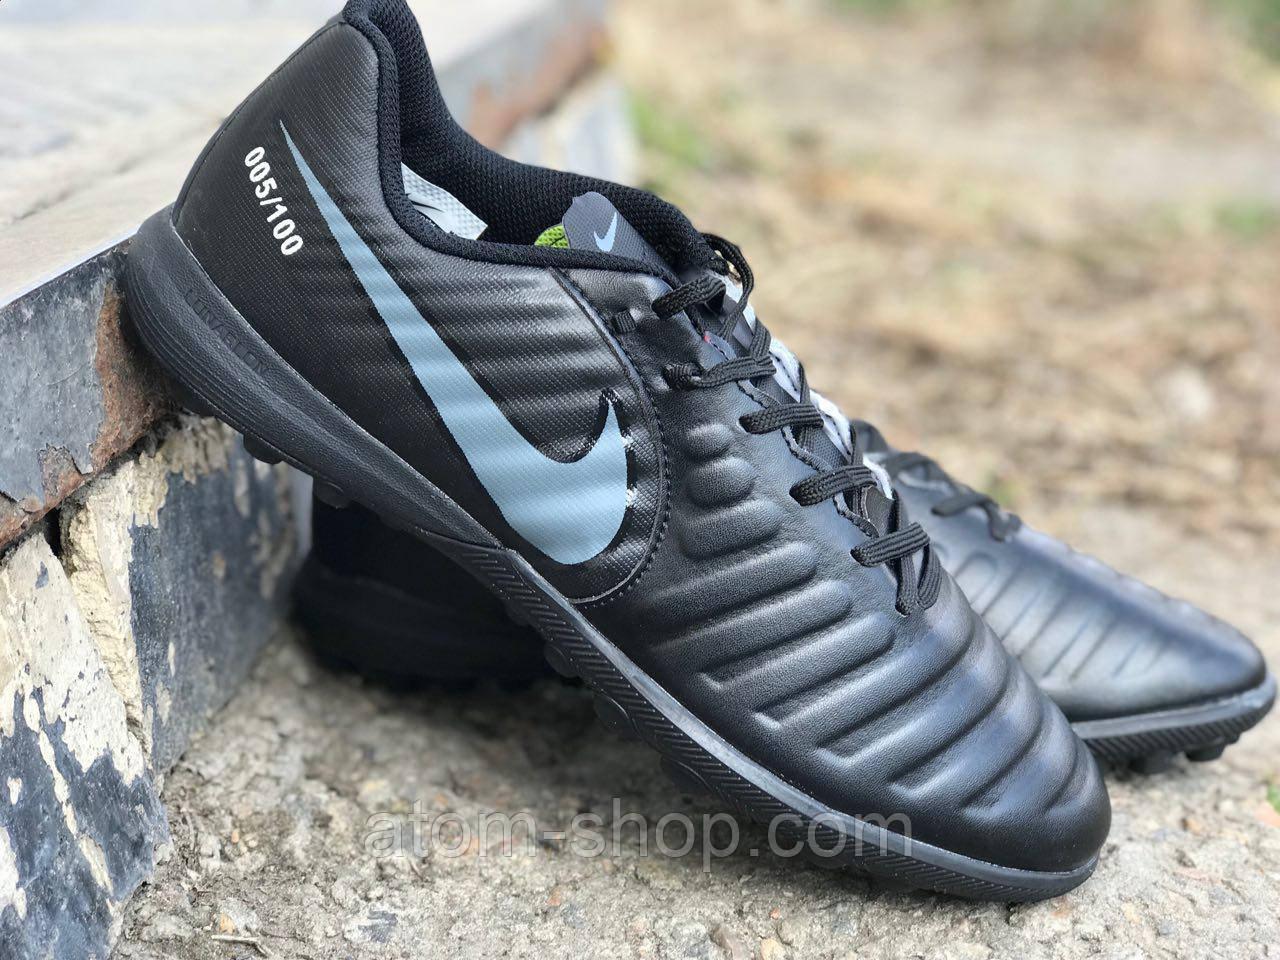 d7e4956a Сороконожки Nike Tiempo Black: продажа, цена в Харькове. футбольная ...